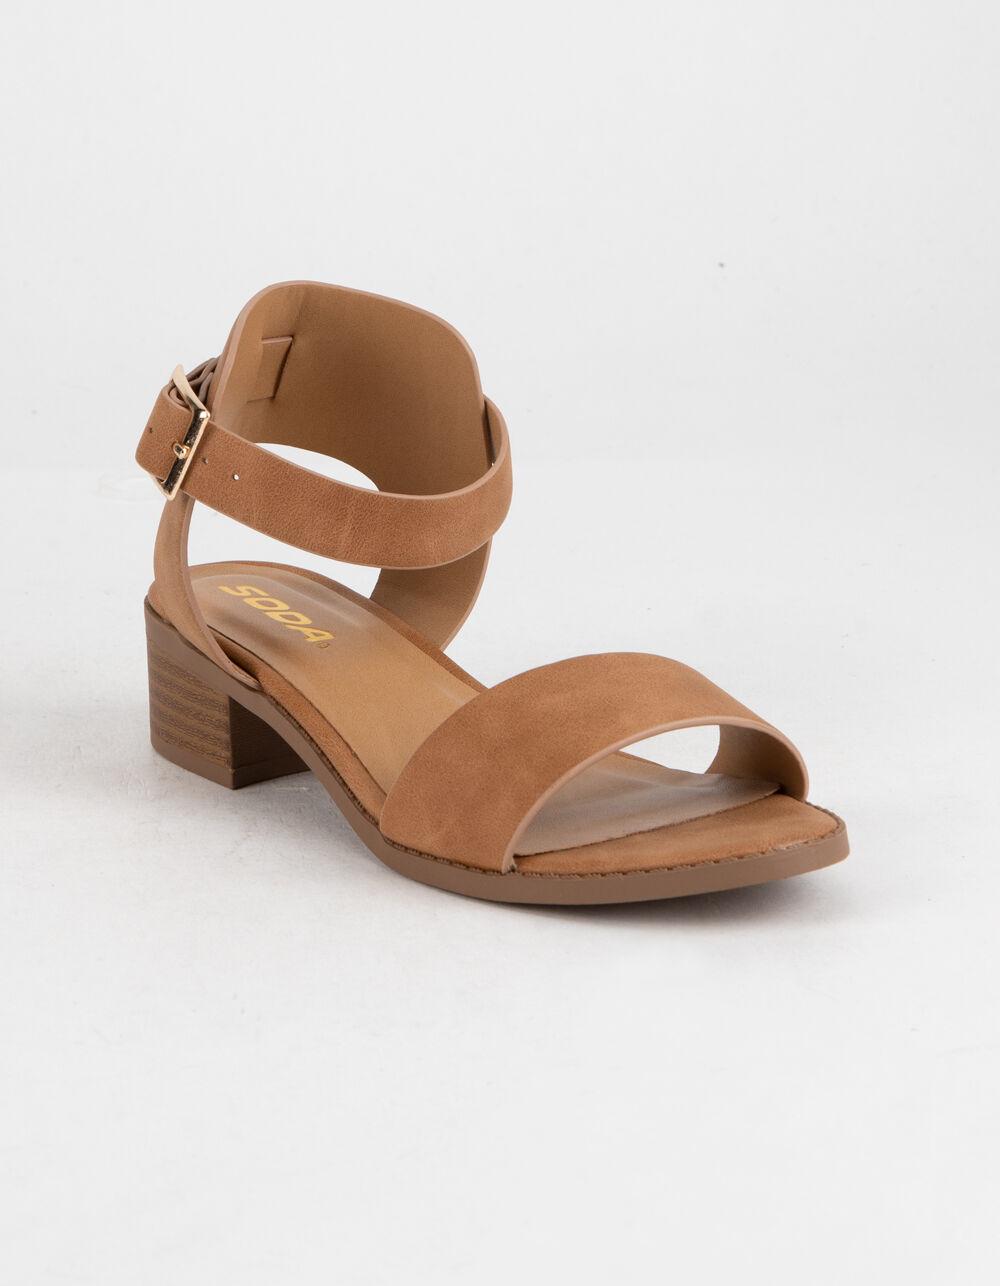 SODA Tan Girls Heeled Sandals